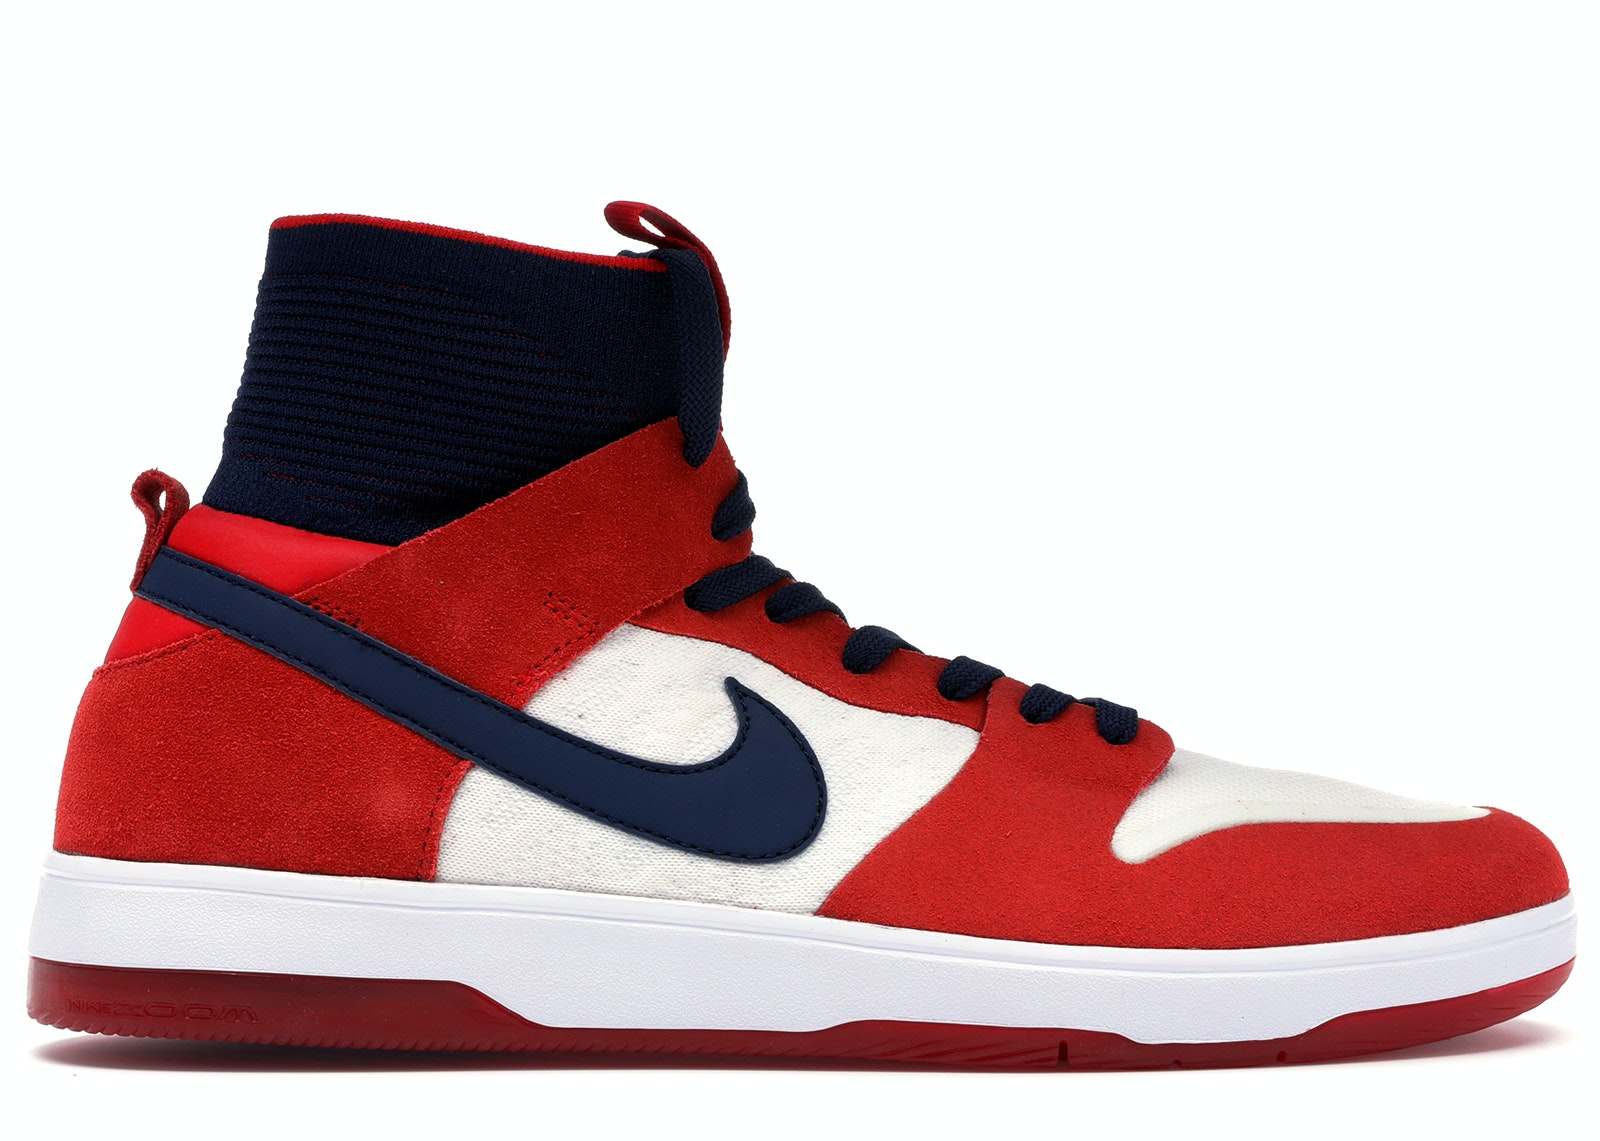 Nike SB Dunk High Elite Red Navy White